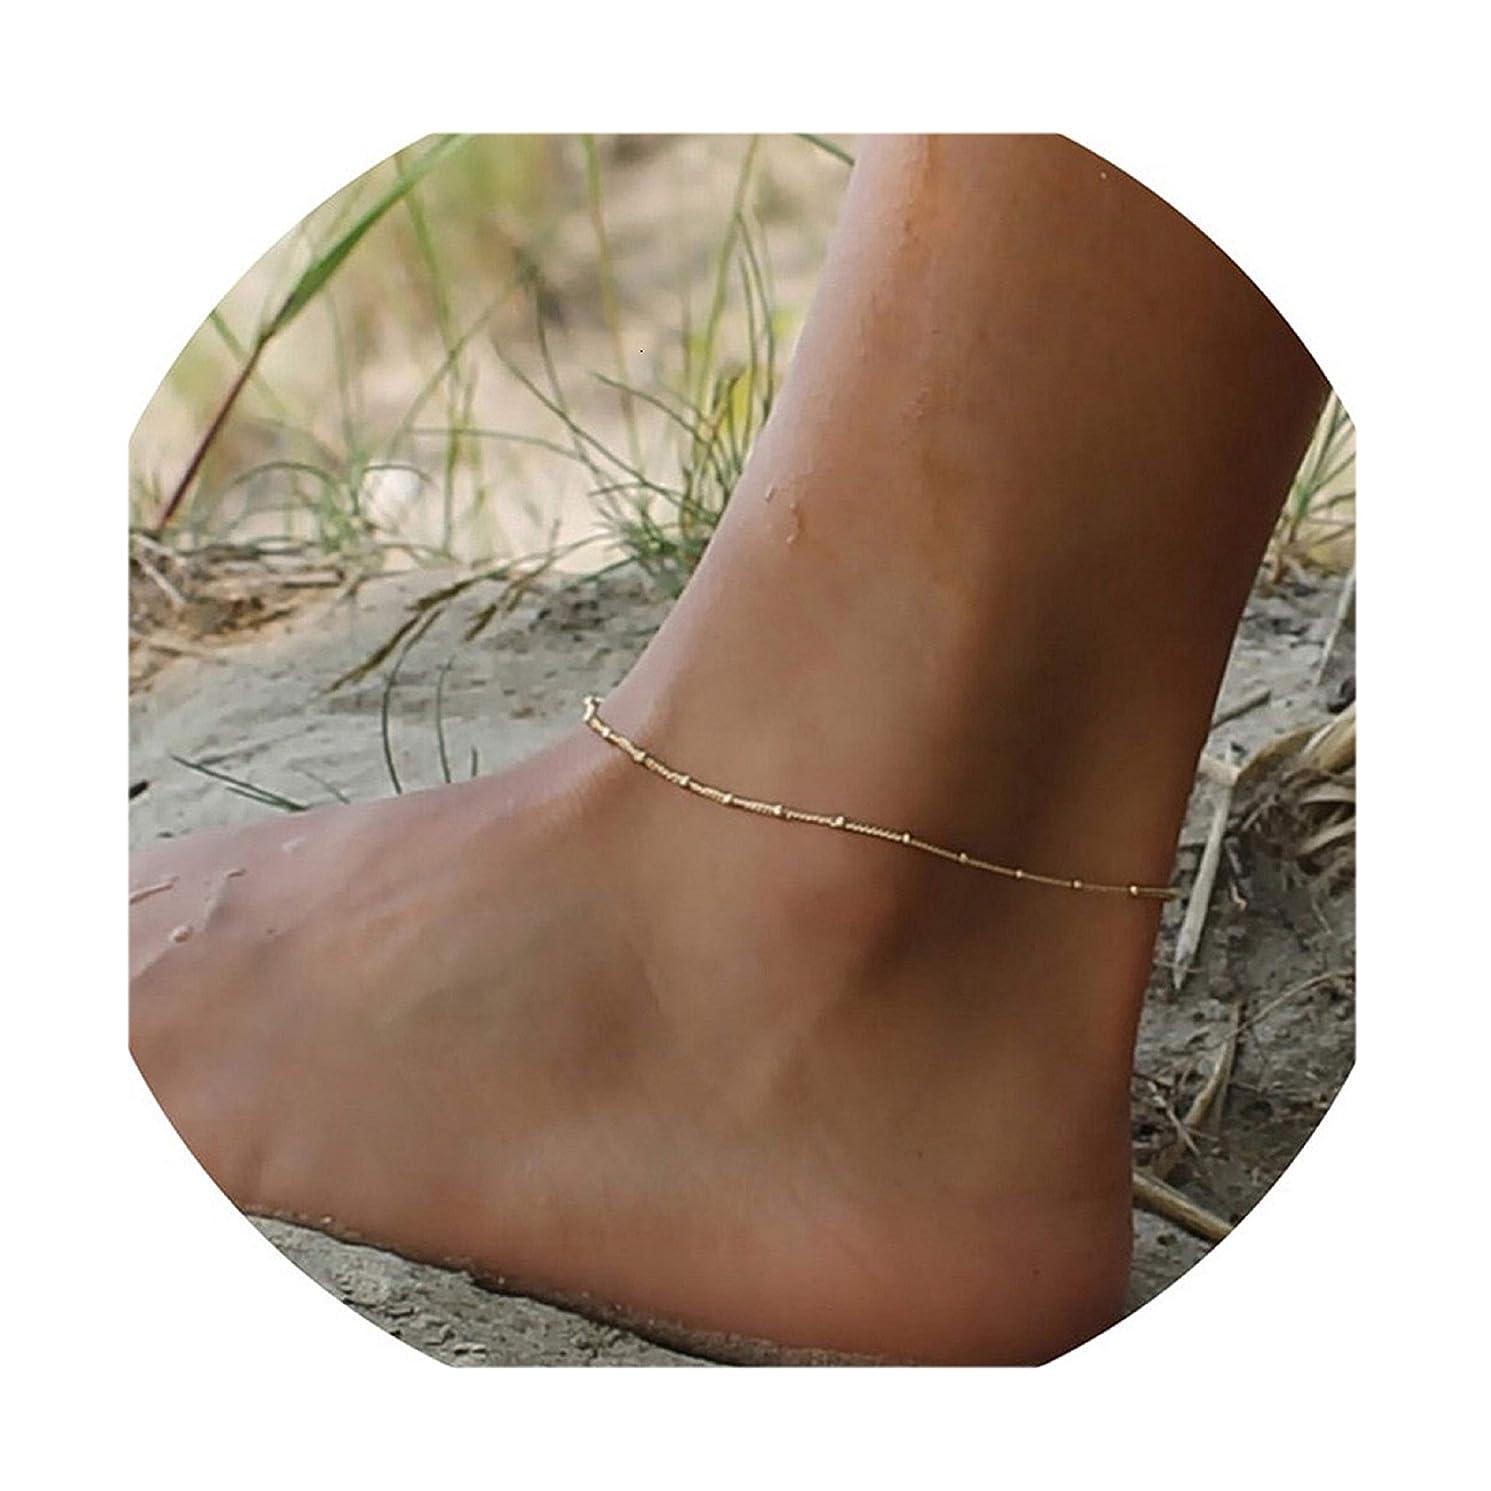 Valloey Women Girls Handmade Dainty Anklet Silver 14K Gold Filled Bead Boho Beach Rhinestone Foot Chain Multi Colored Evil Eye Adjustable Ankle Bracelet for Women